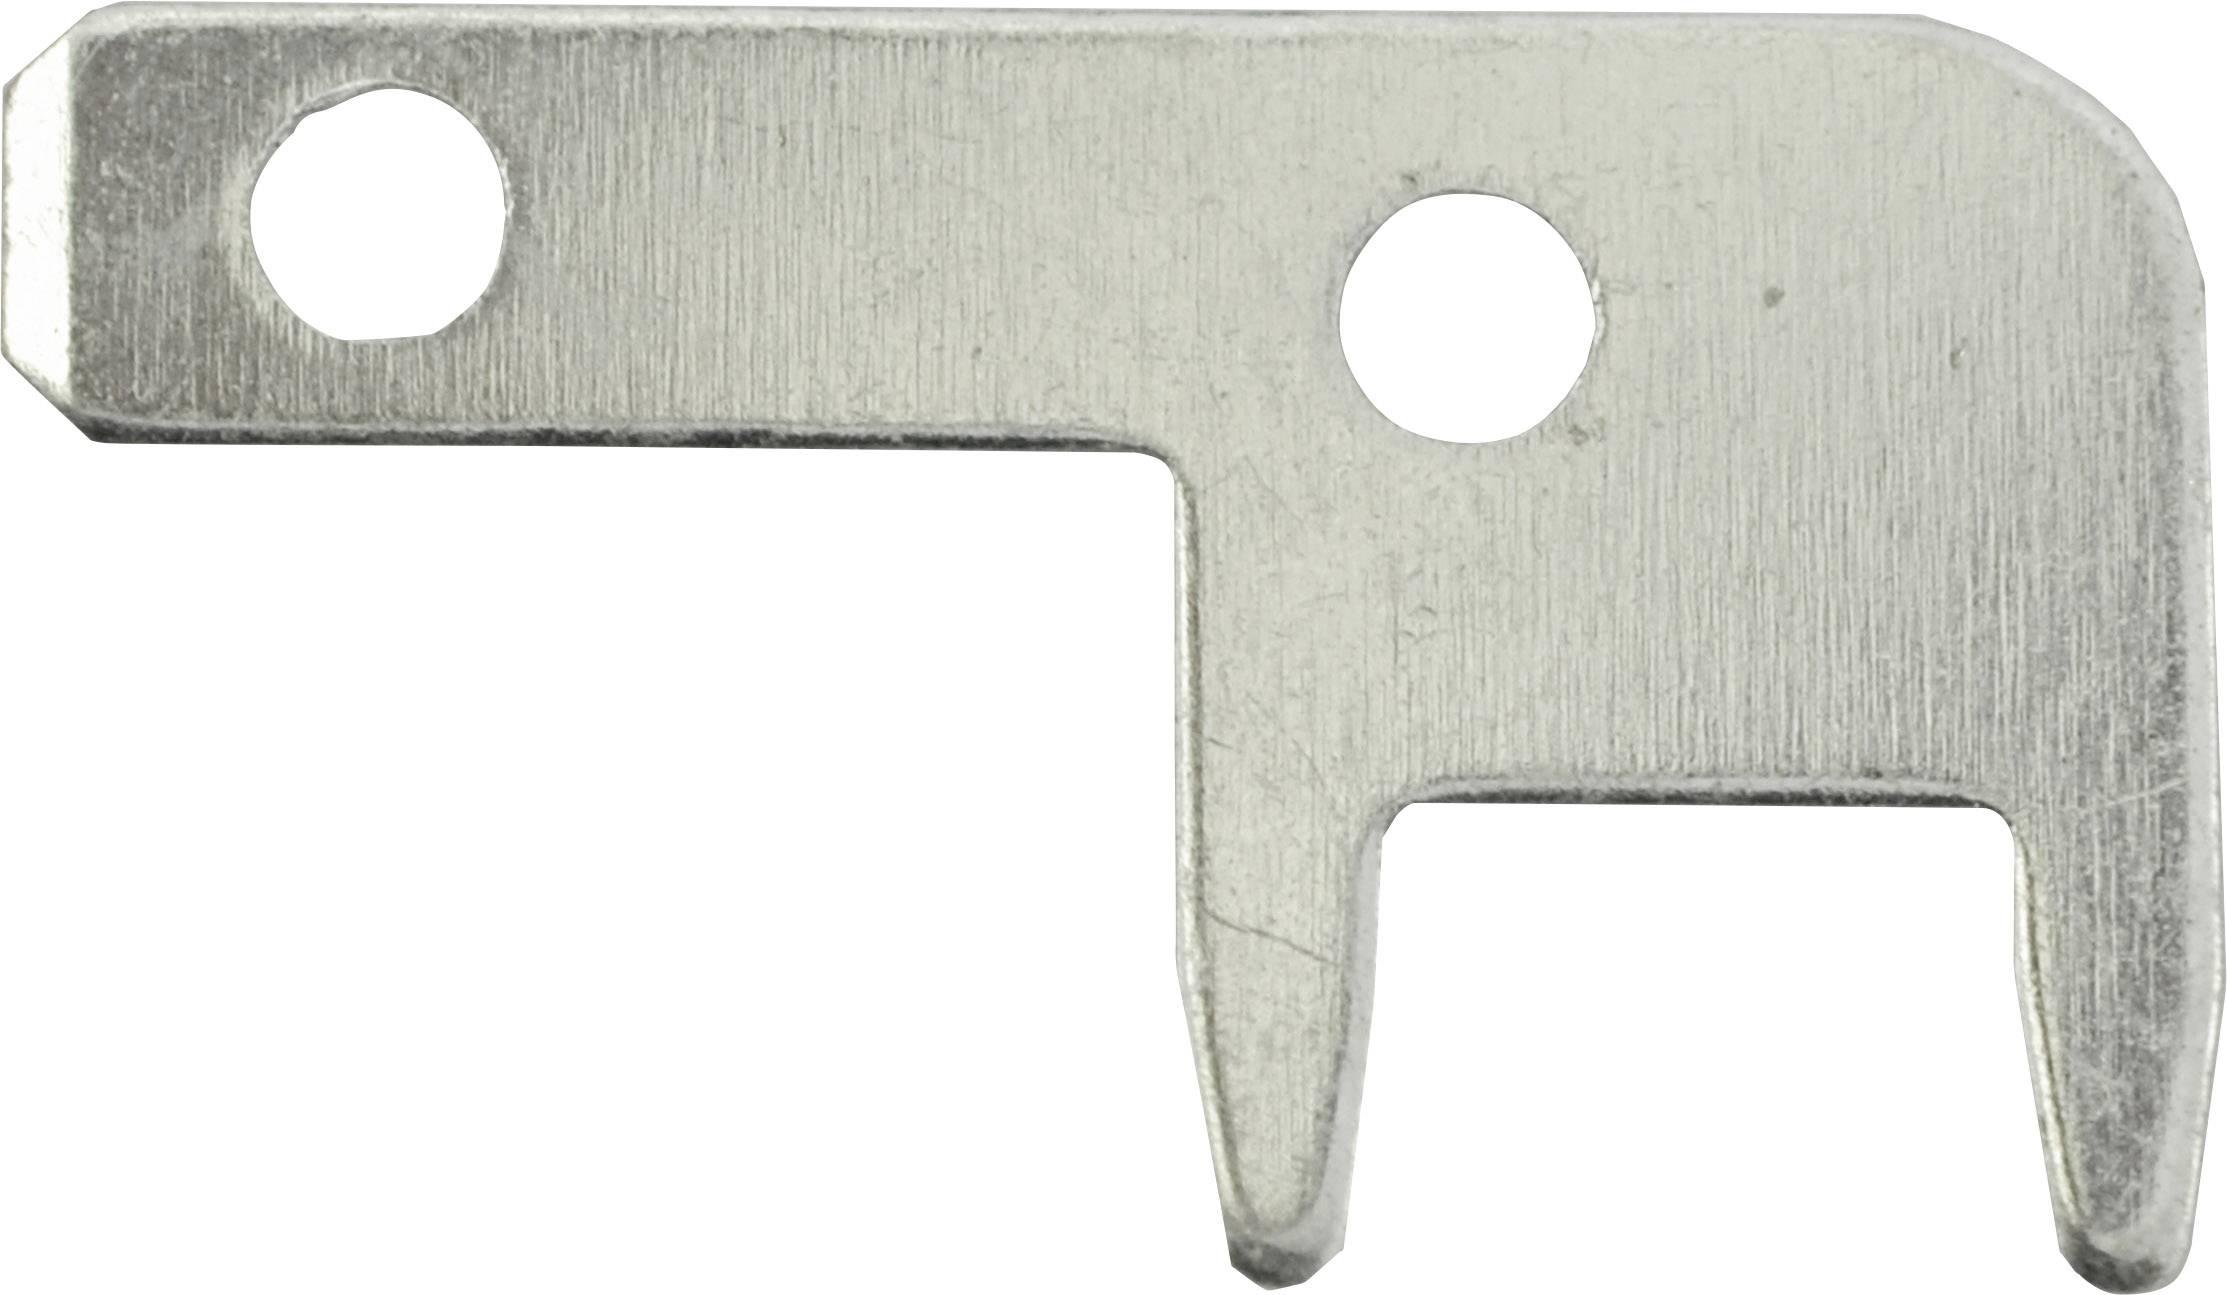 Faston zástrčka Vogt Verbindungstechnik 3789c05.68 2.8 mm x 0.5 mm, 90 °, bez izolace, kov, 100 ks